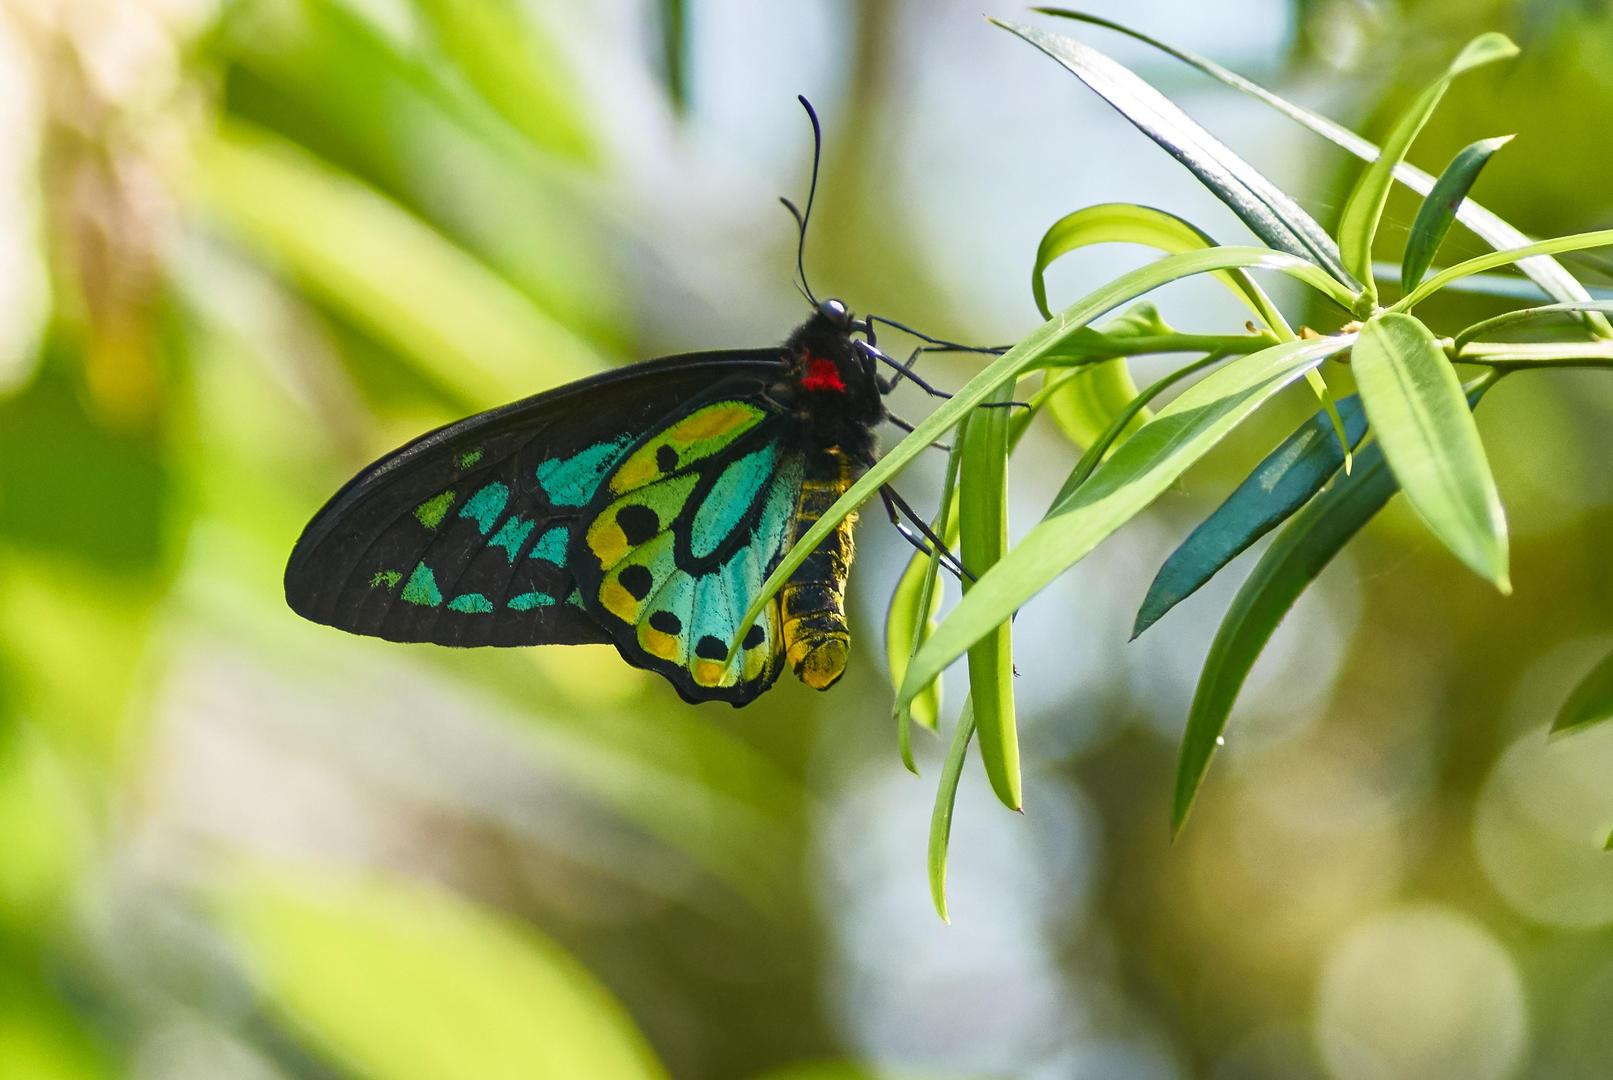 Pararistolochia praevenosa (Birdwing Butterfly Vine)